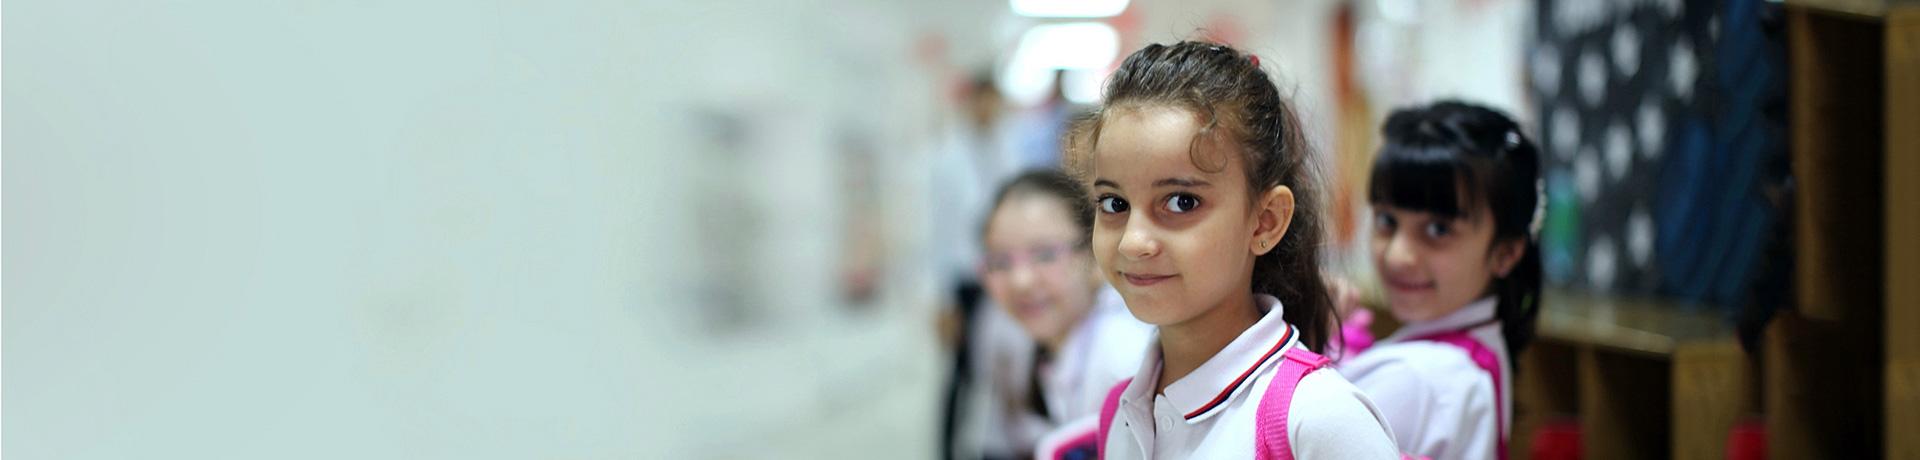 Gulf British Academy values empathy